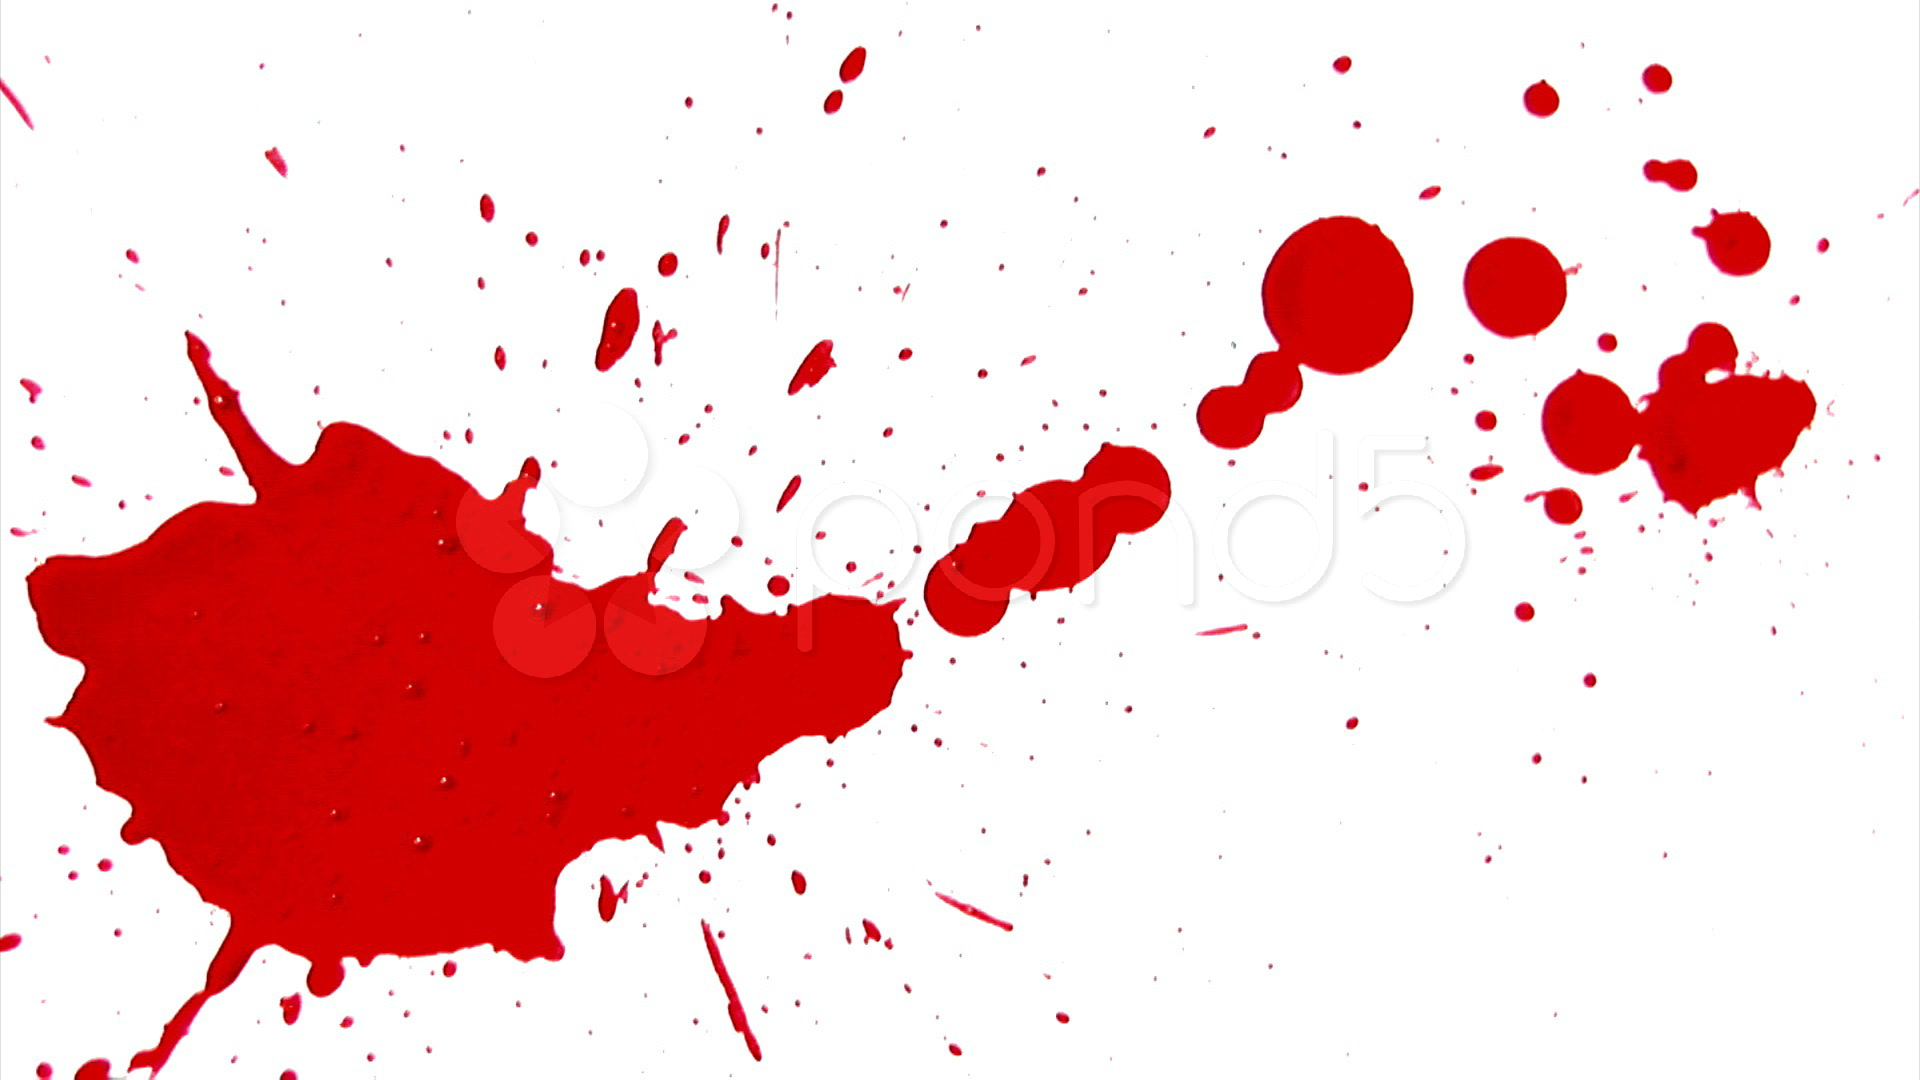 bloody splatter wallpaper - photo #45